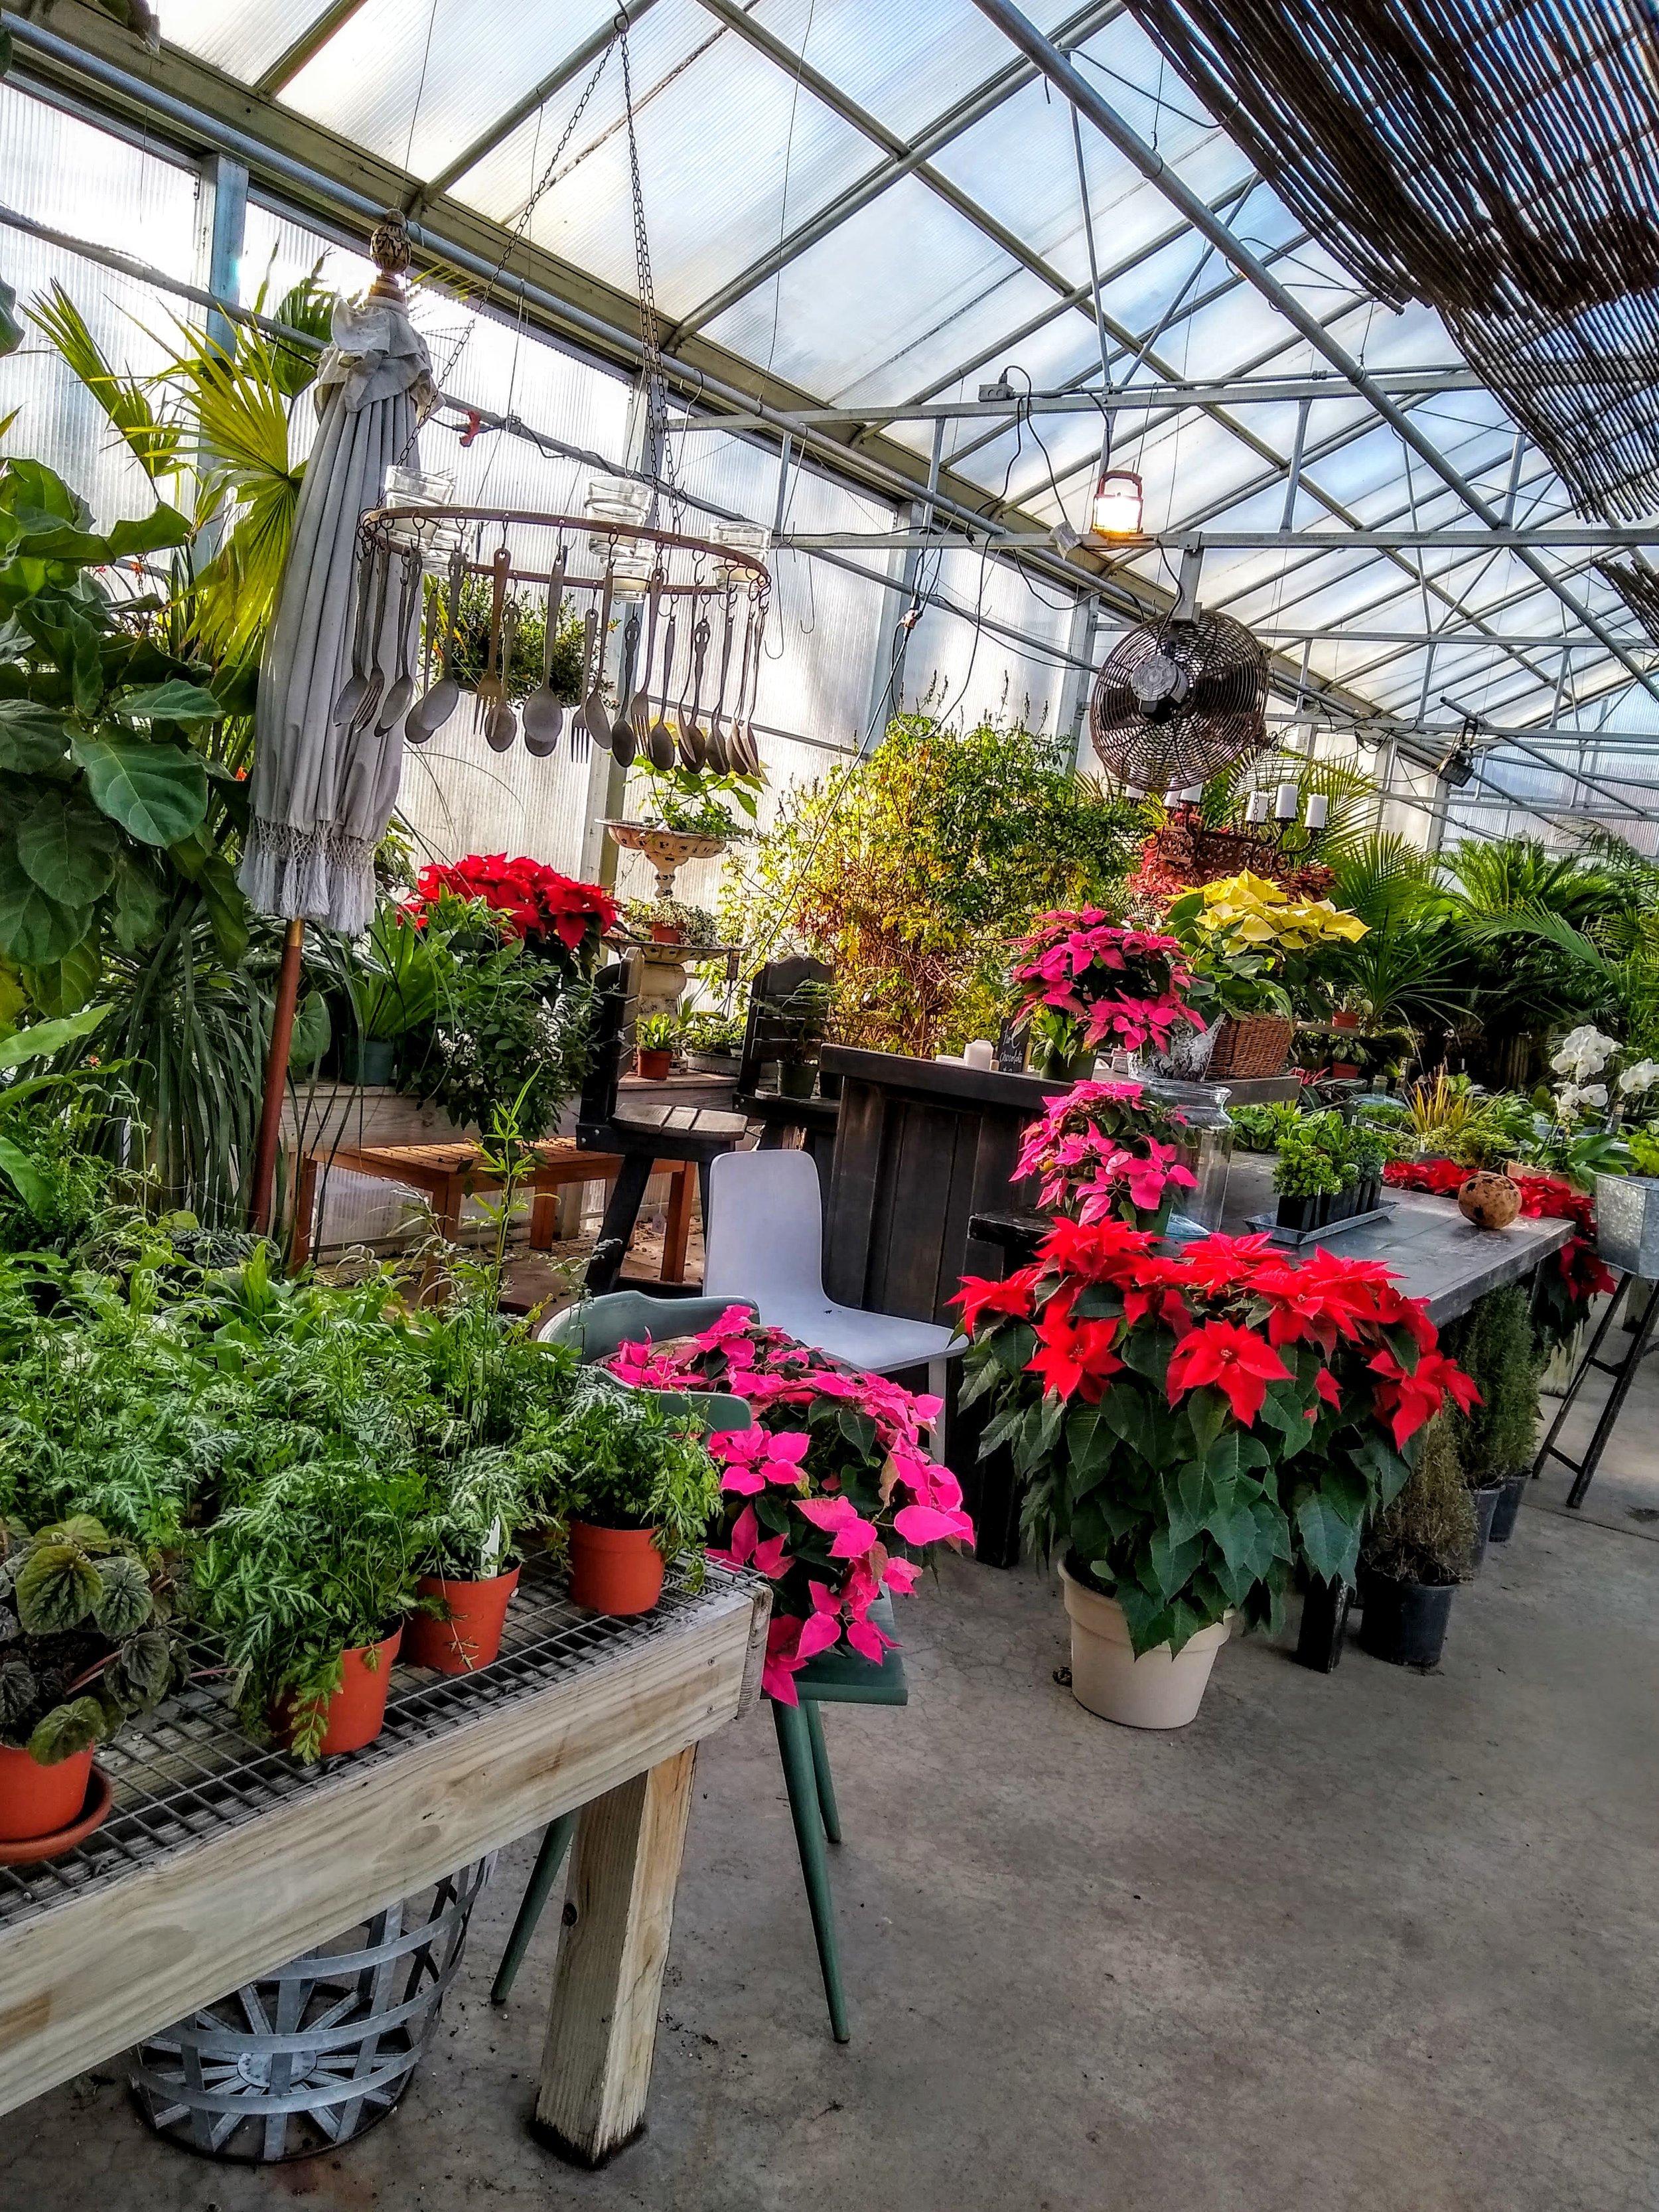 Herbary-Greenhouse-1.jpg